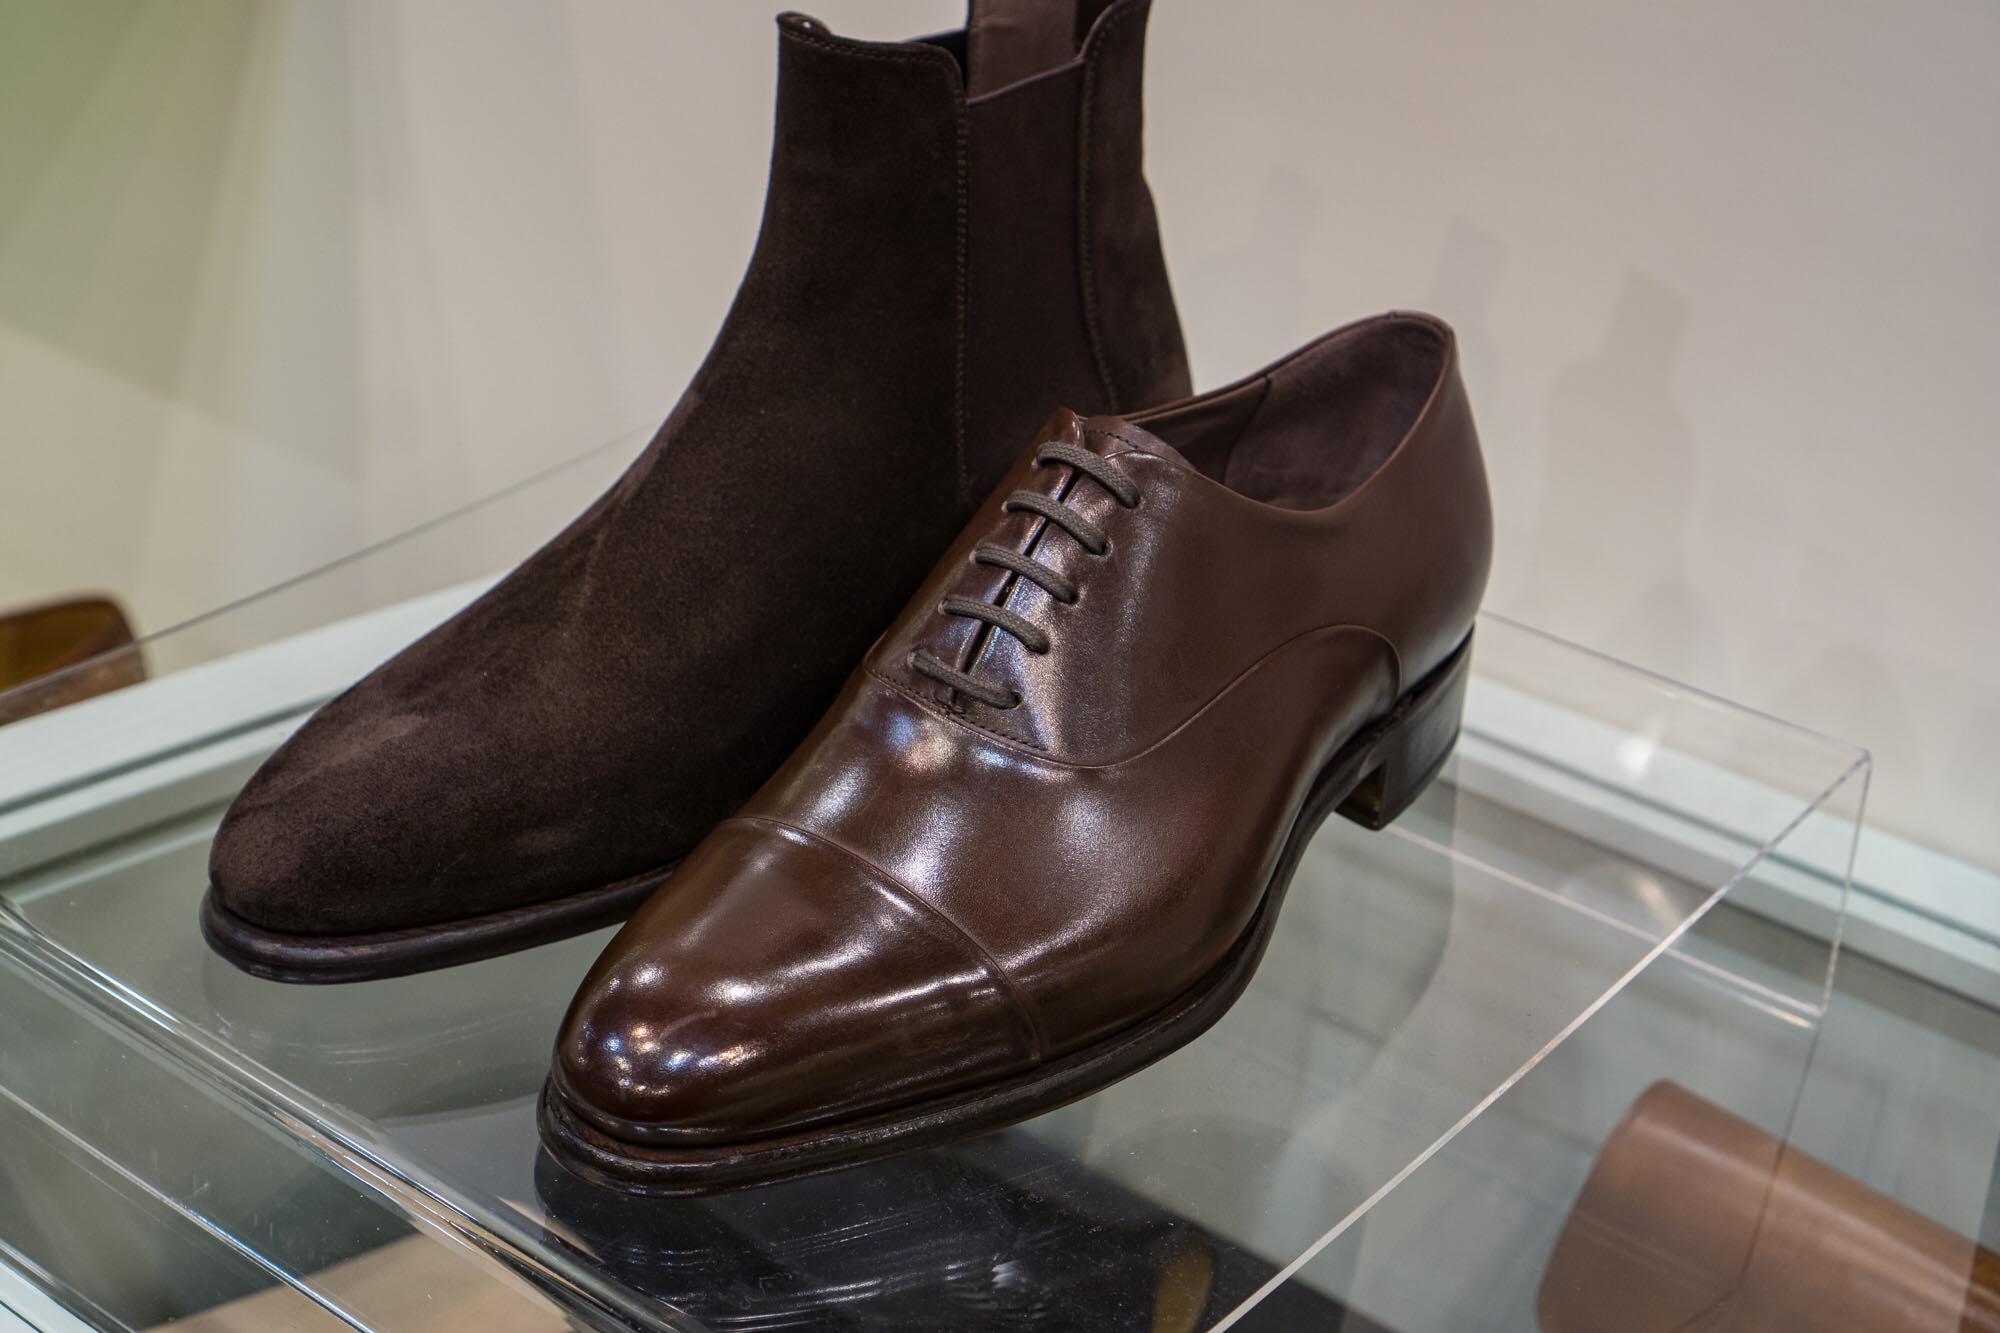 Carlos Santos 9899 Handgrade Oxford in Dark Oak Calf for The Noble Shoe 2